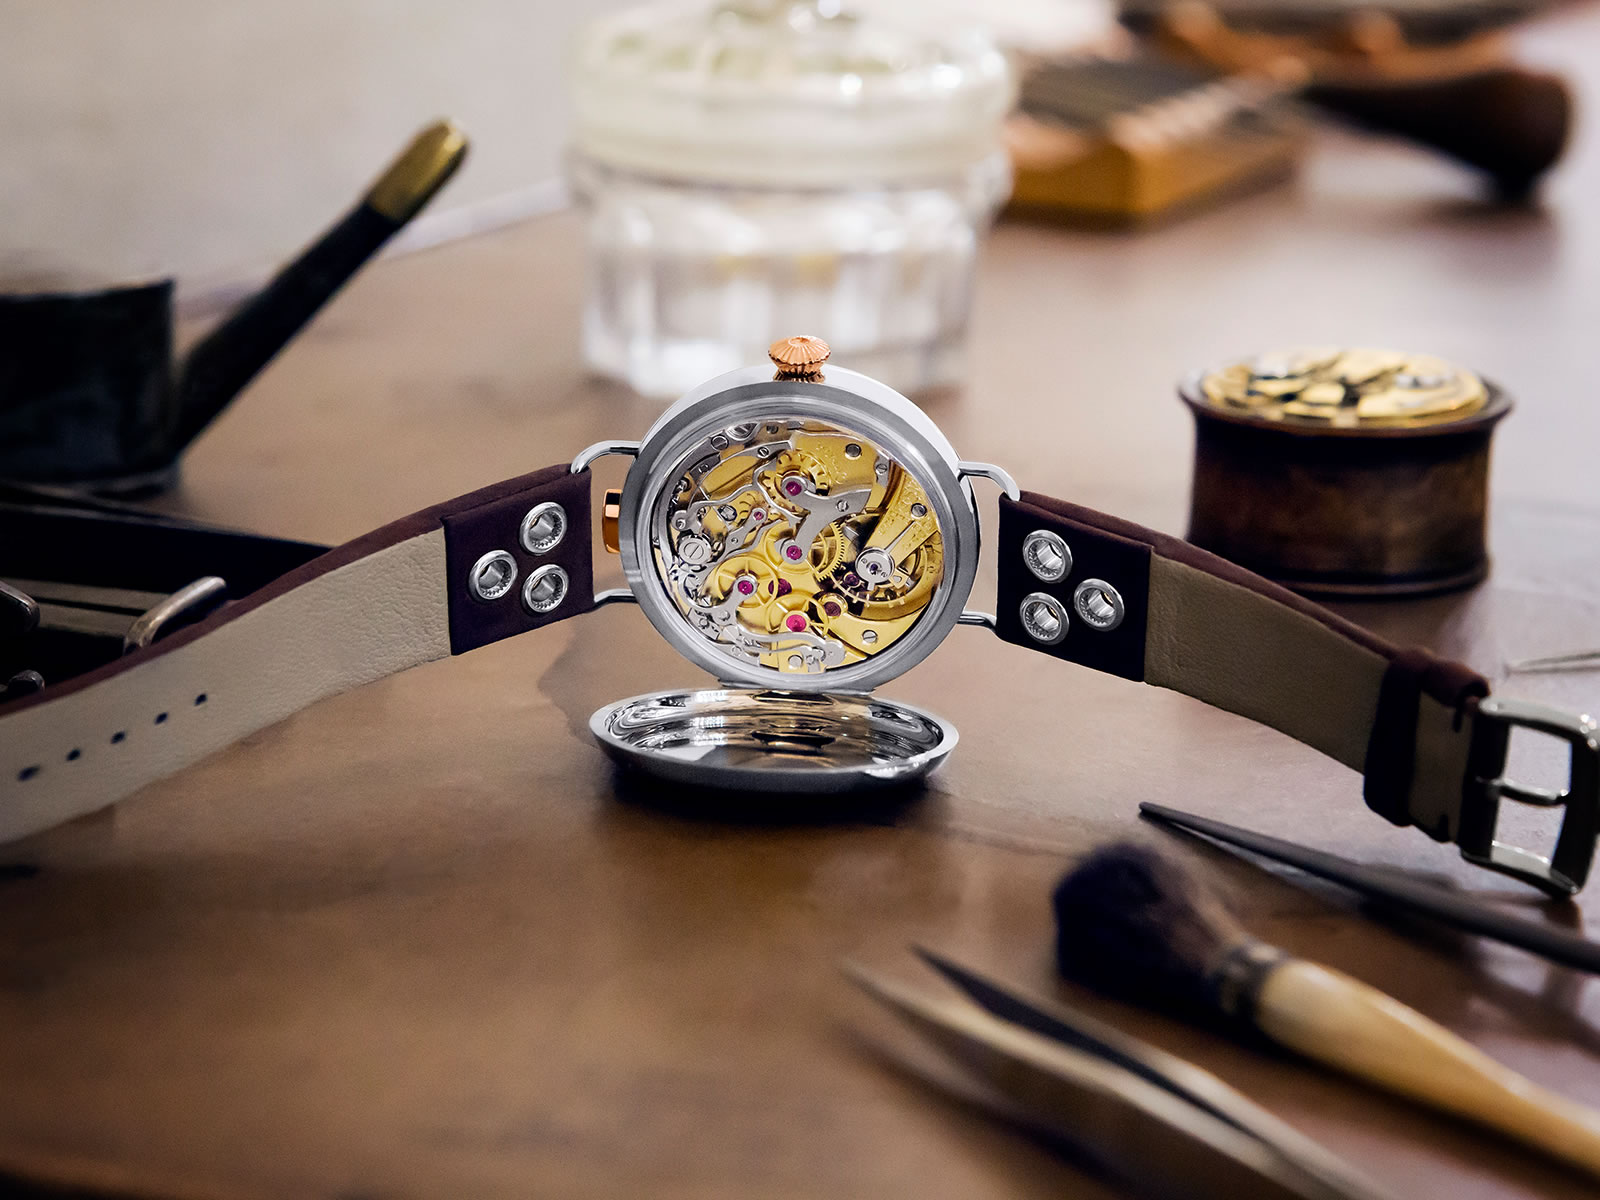 516-52-48-30-04-001-omega-18-chro-wrist-chronograph-limited-edition-5.jpg